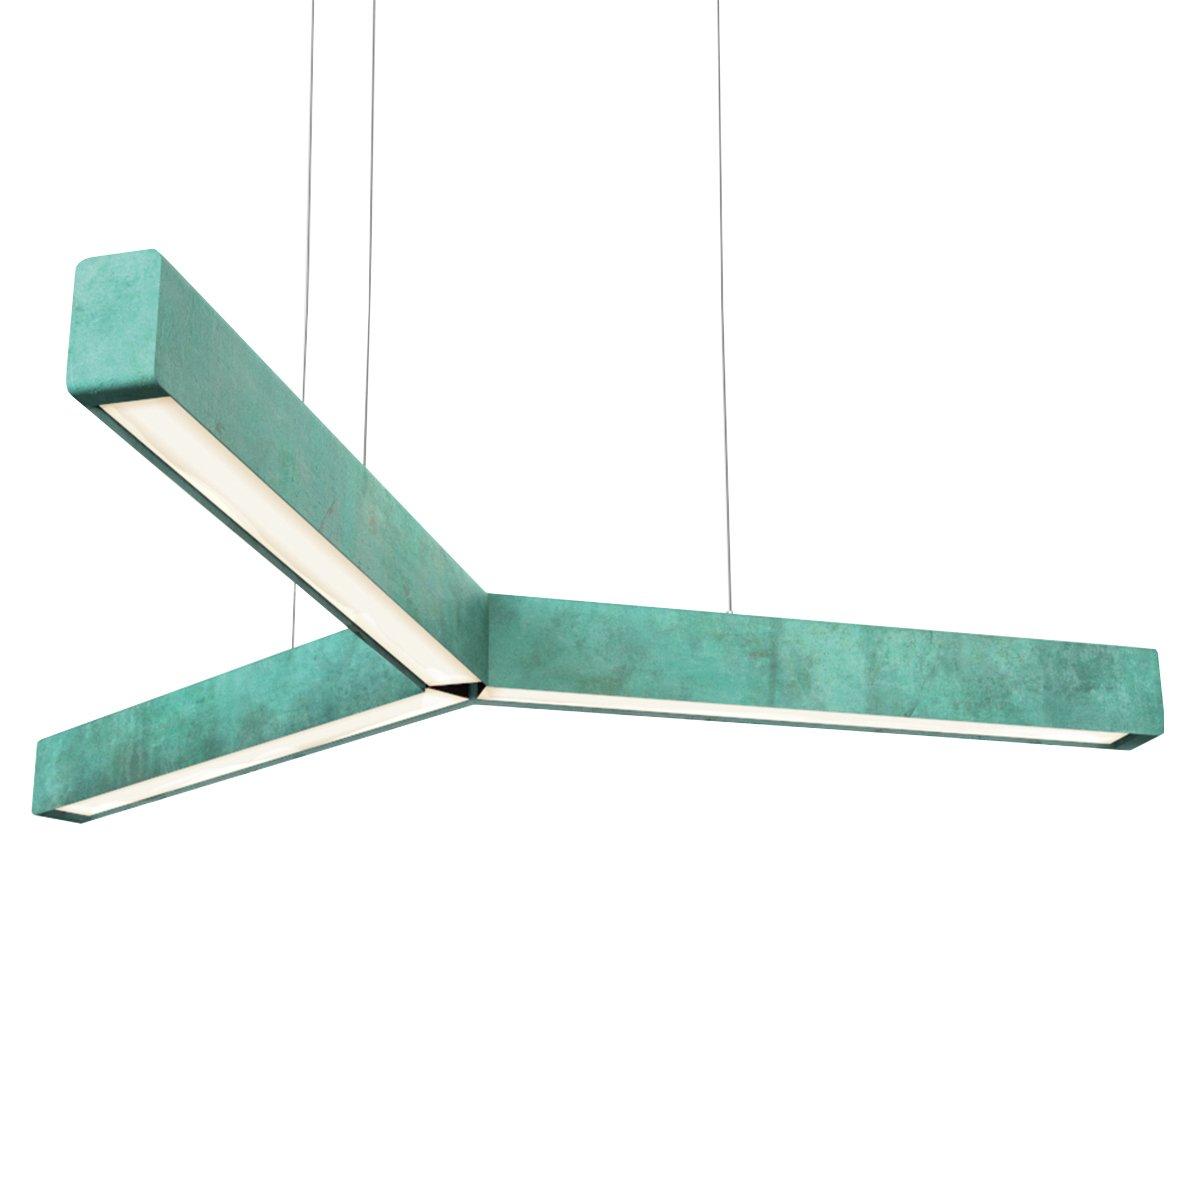 Anour Y Model Hanglamp